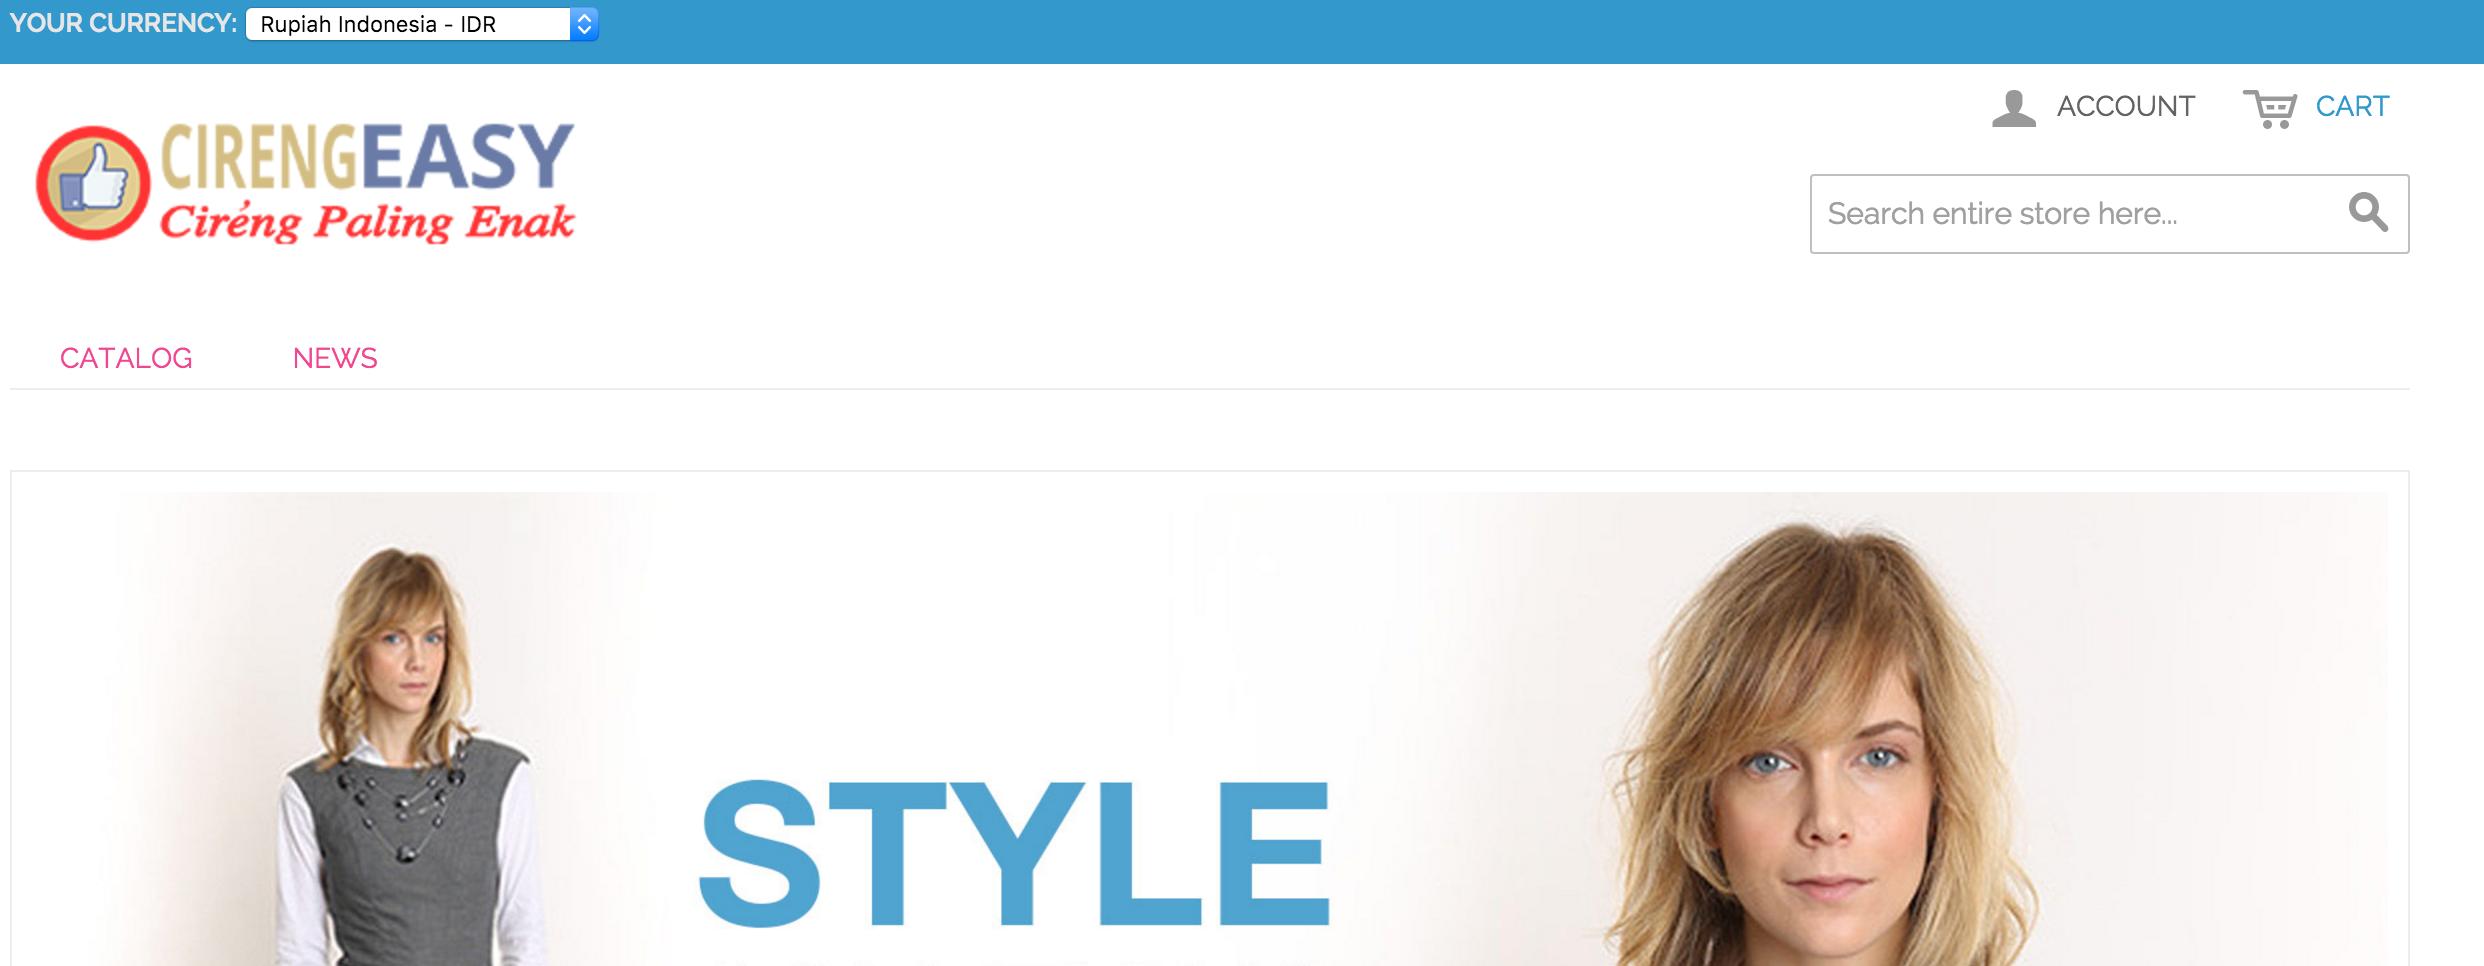 halaman-homepage-magento-dengan-kategori-news-nyingspot.com